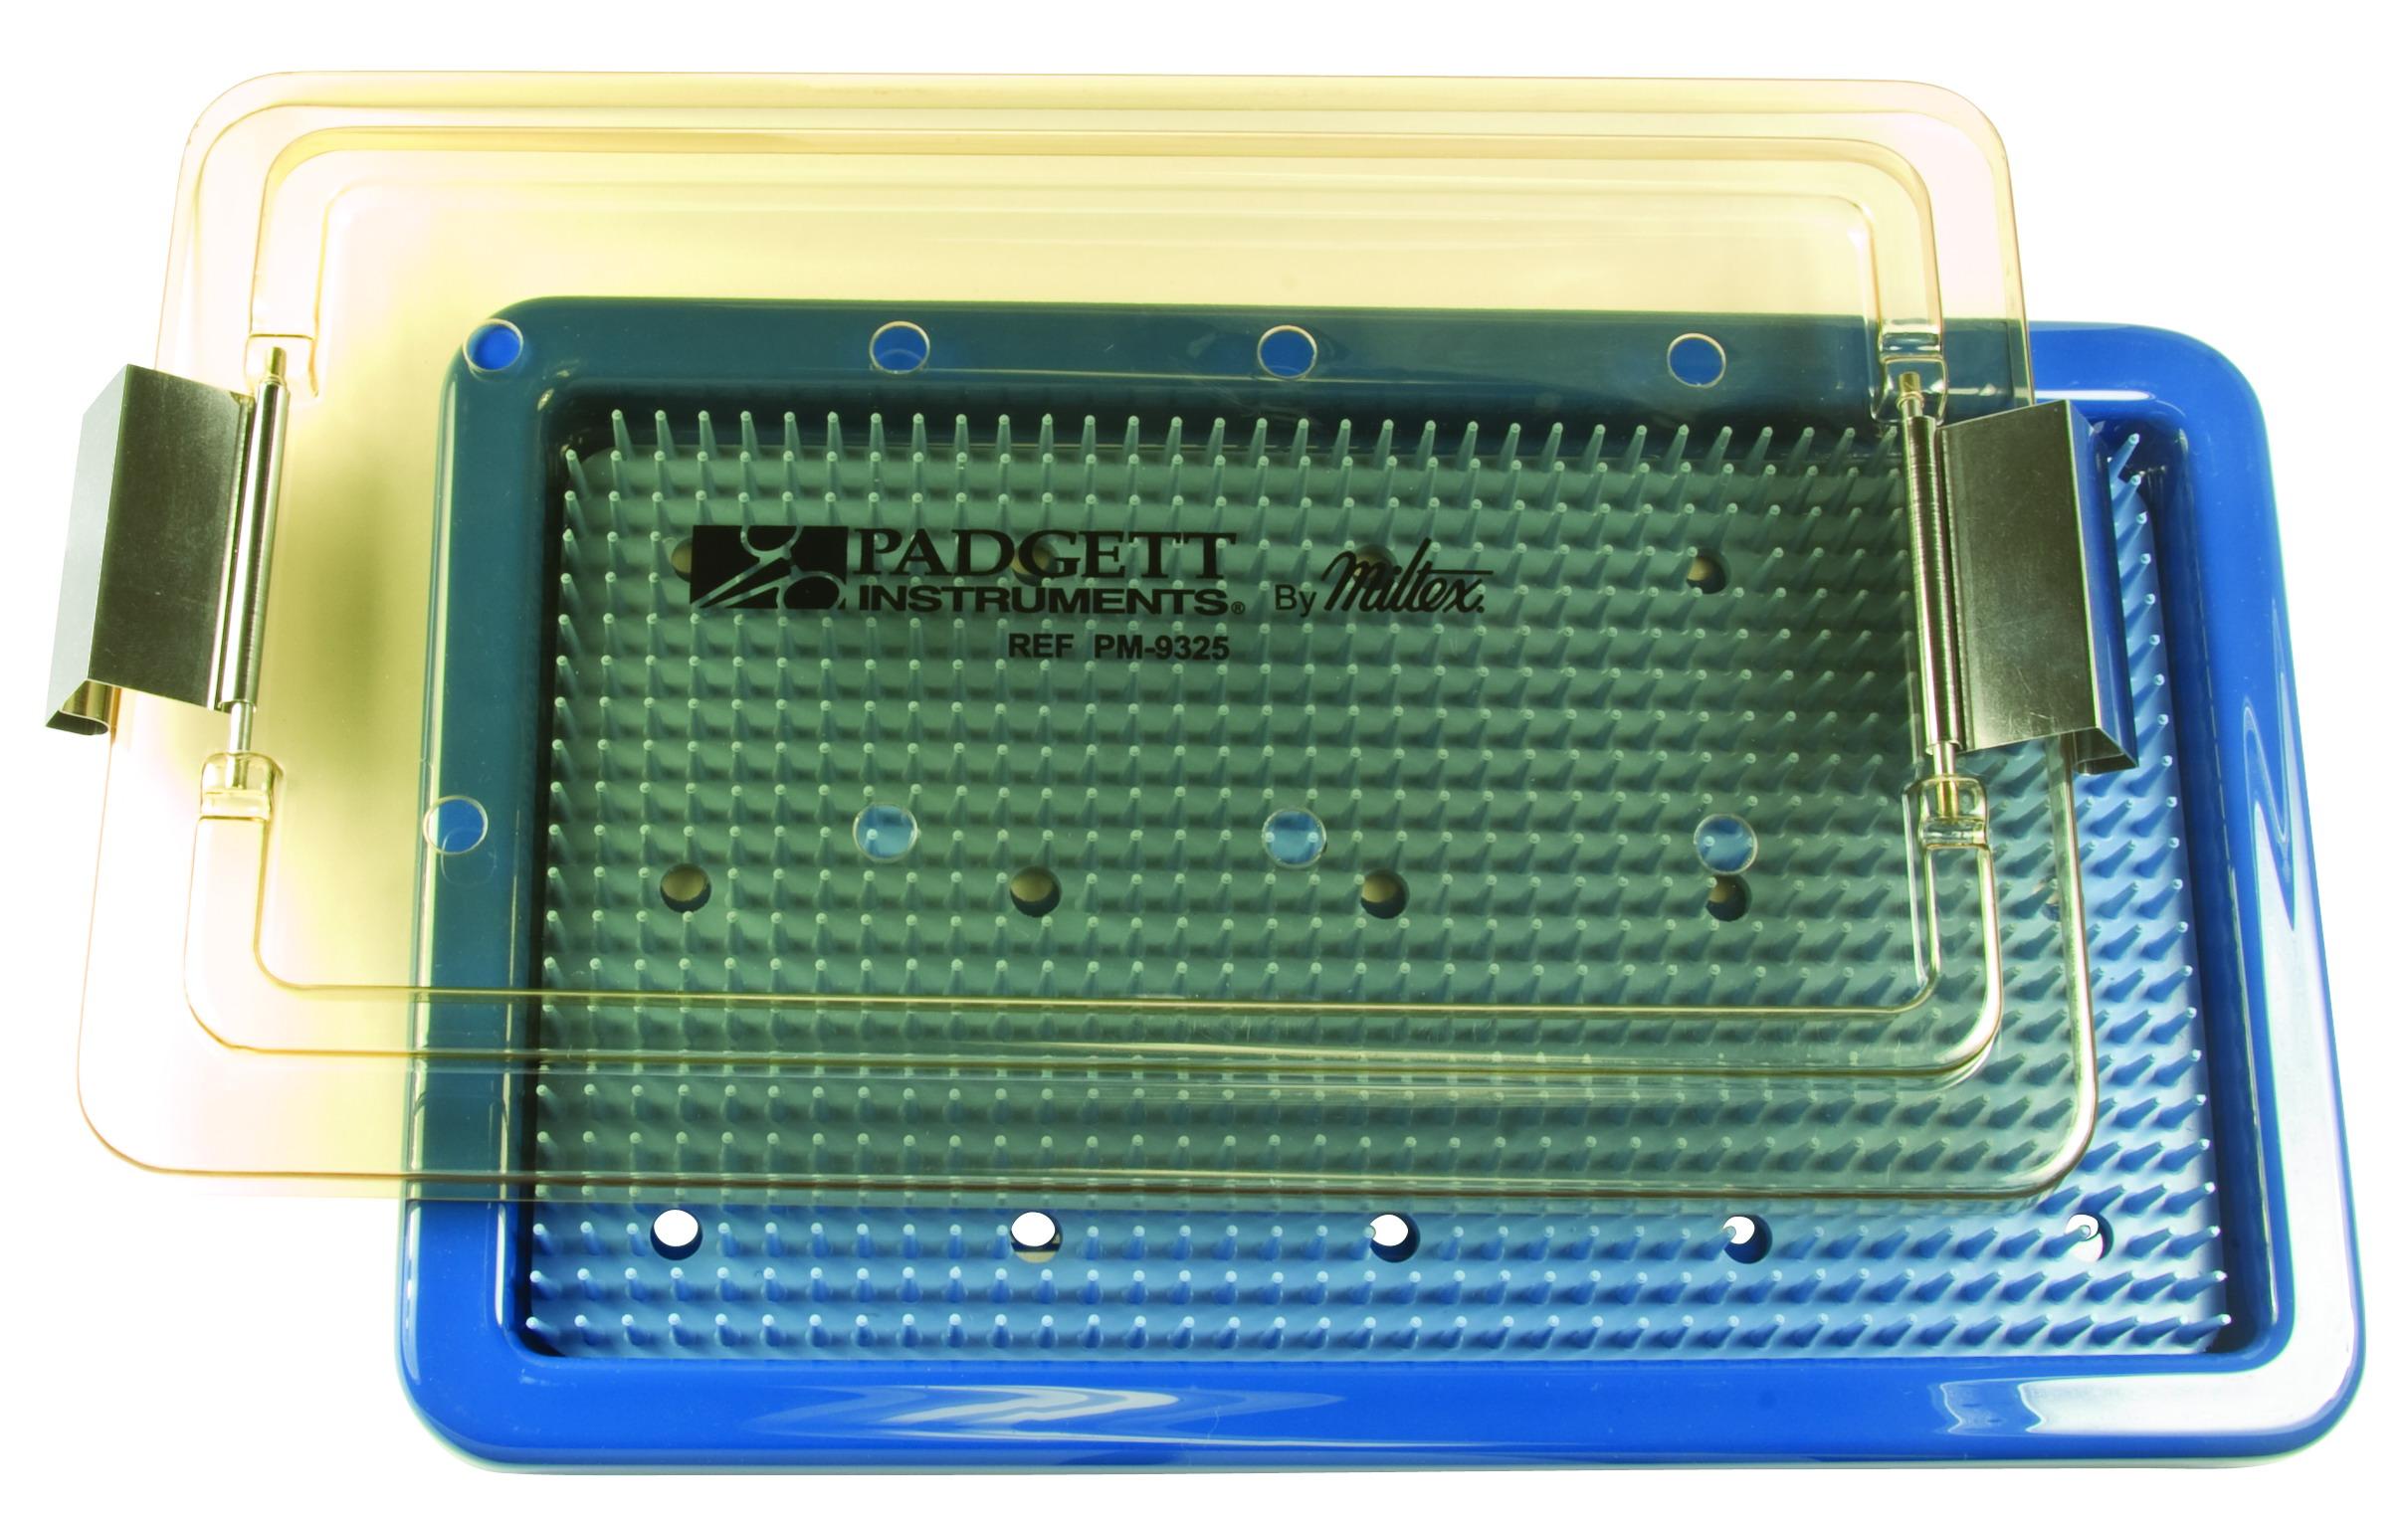 sterilization-tray-for-micro-surgery-instruments-11-x-7-x-3-pm-9325-miltex.jpg